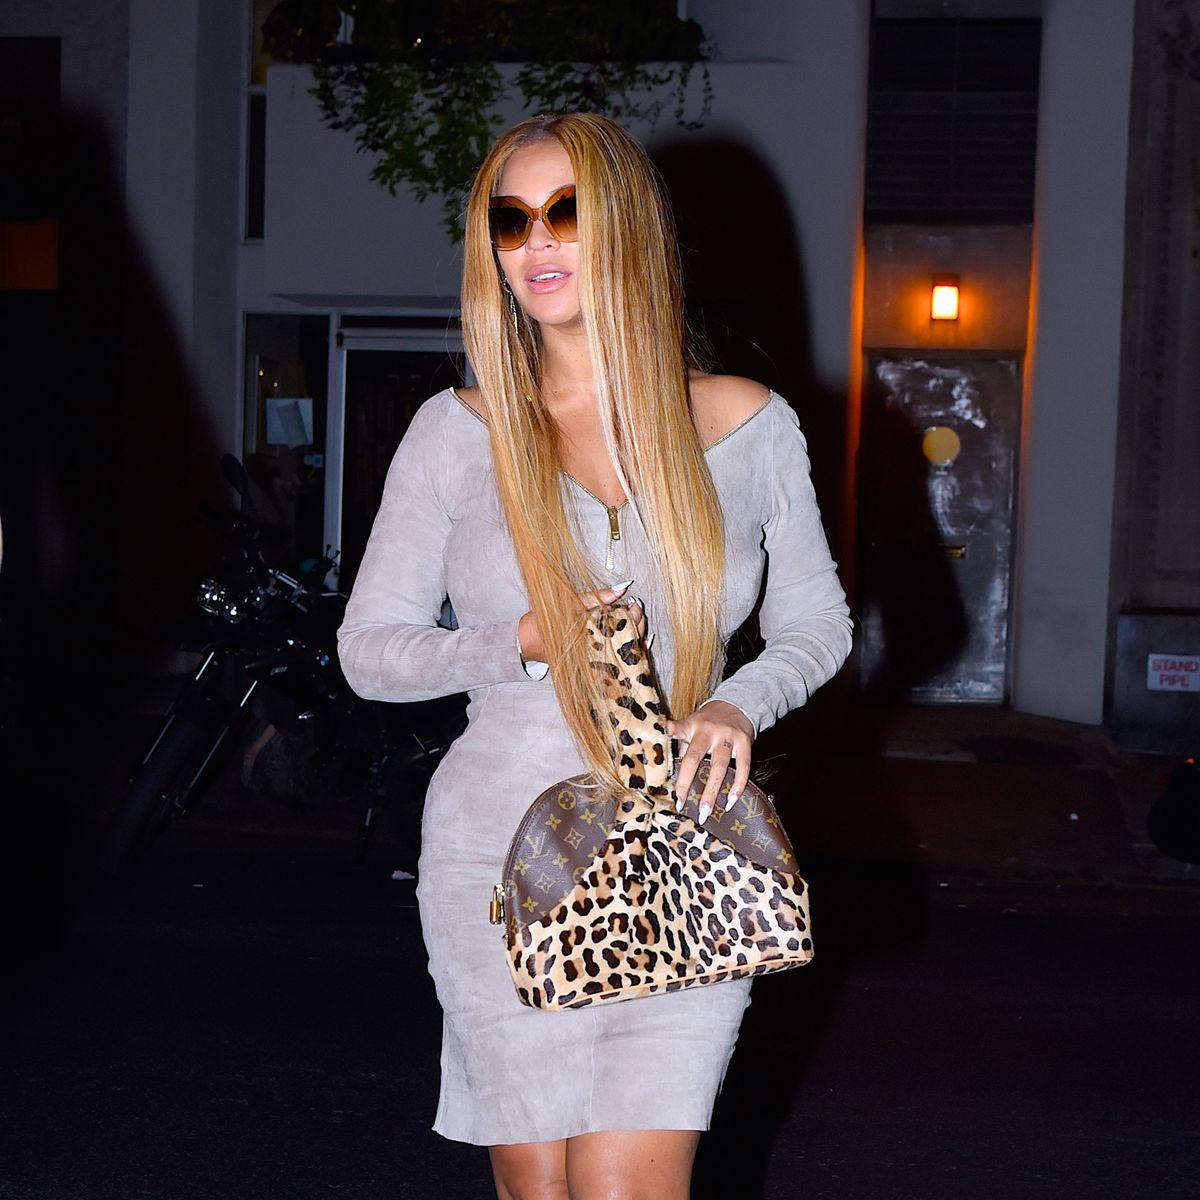 Beyonce carrying a leopard-print Louis Vuitton bag.